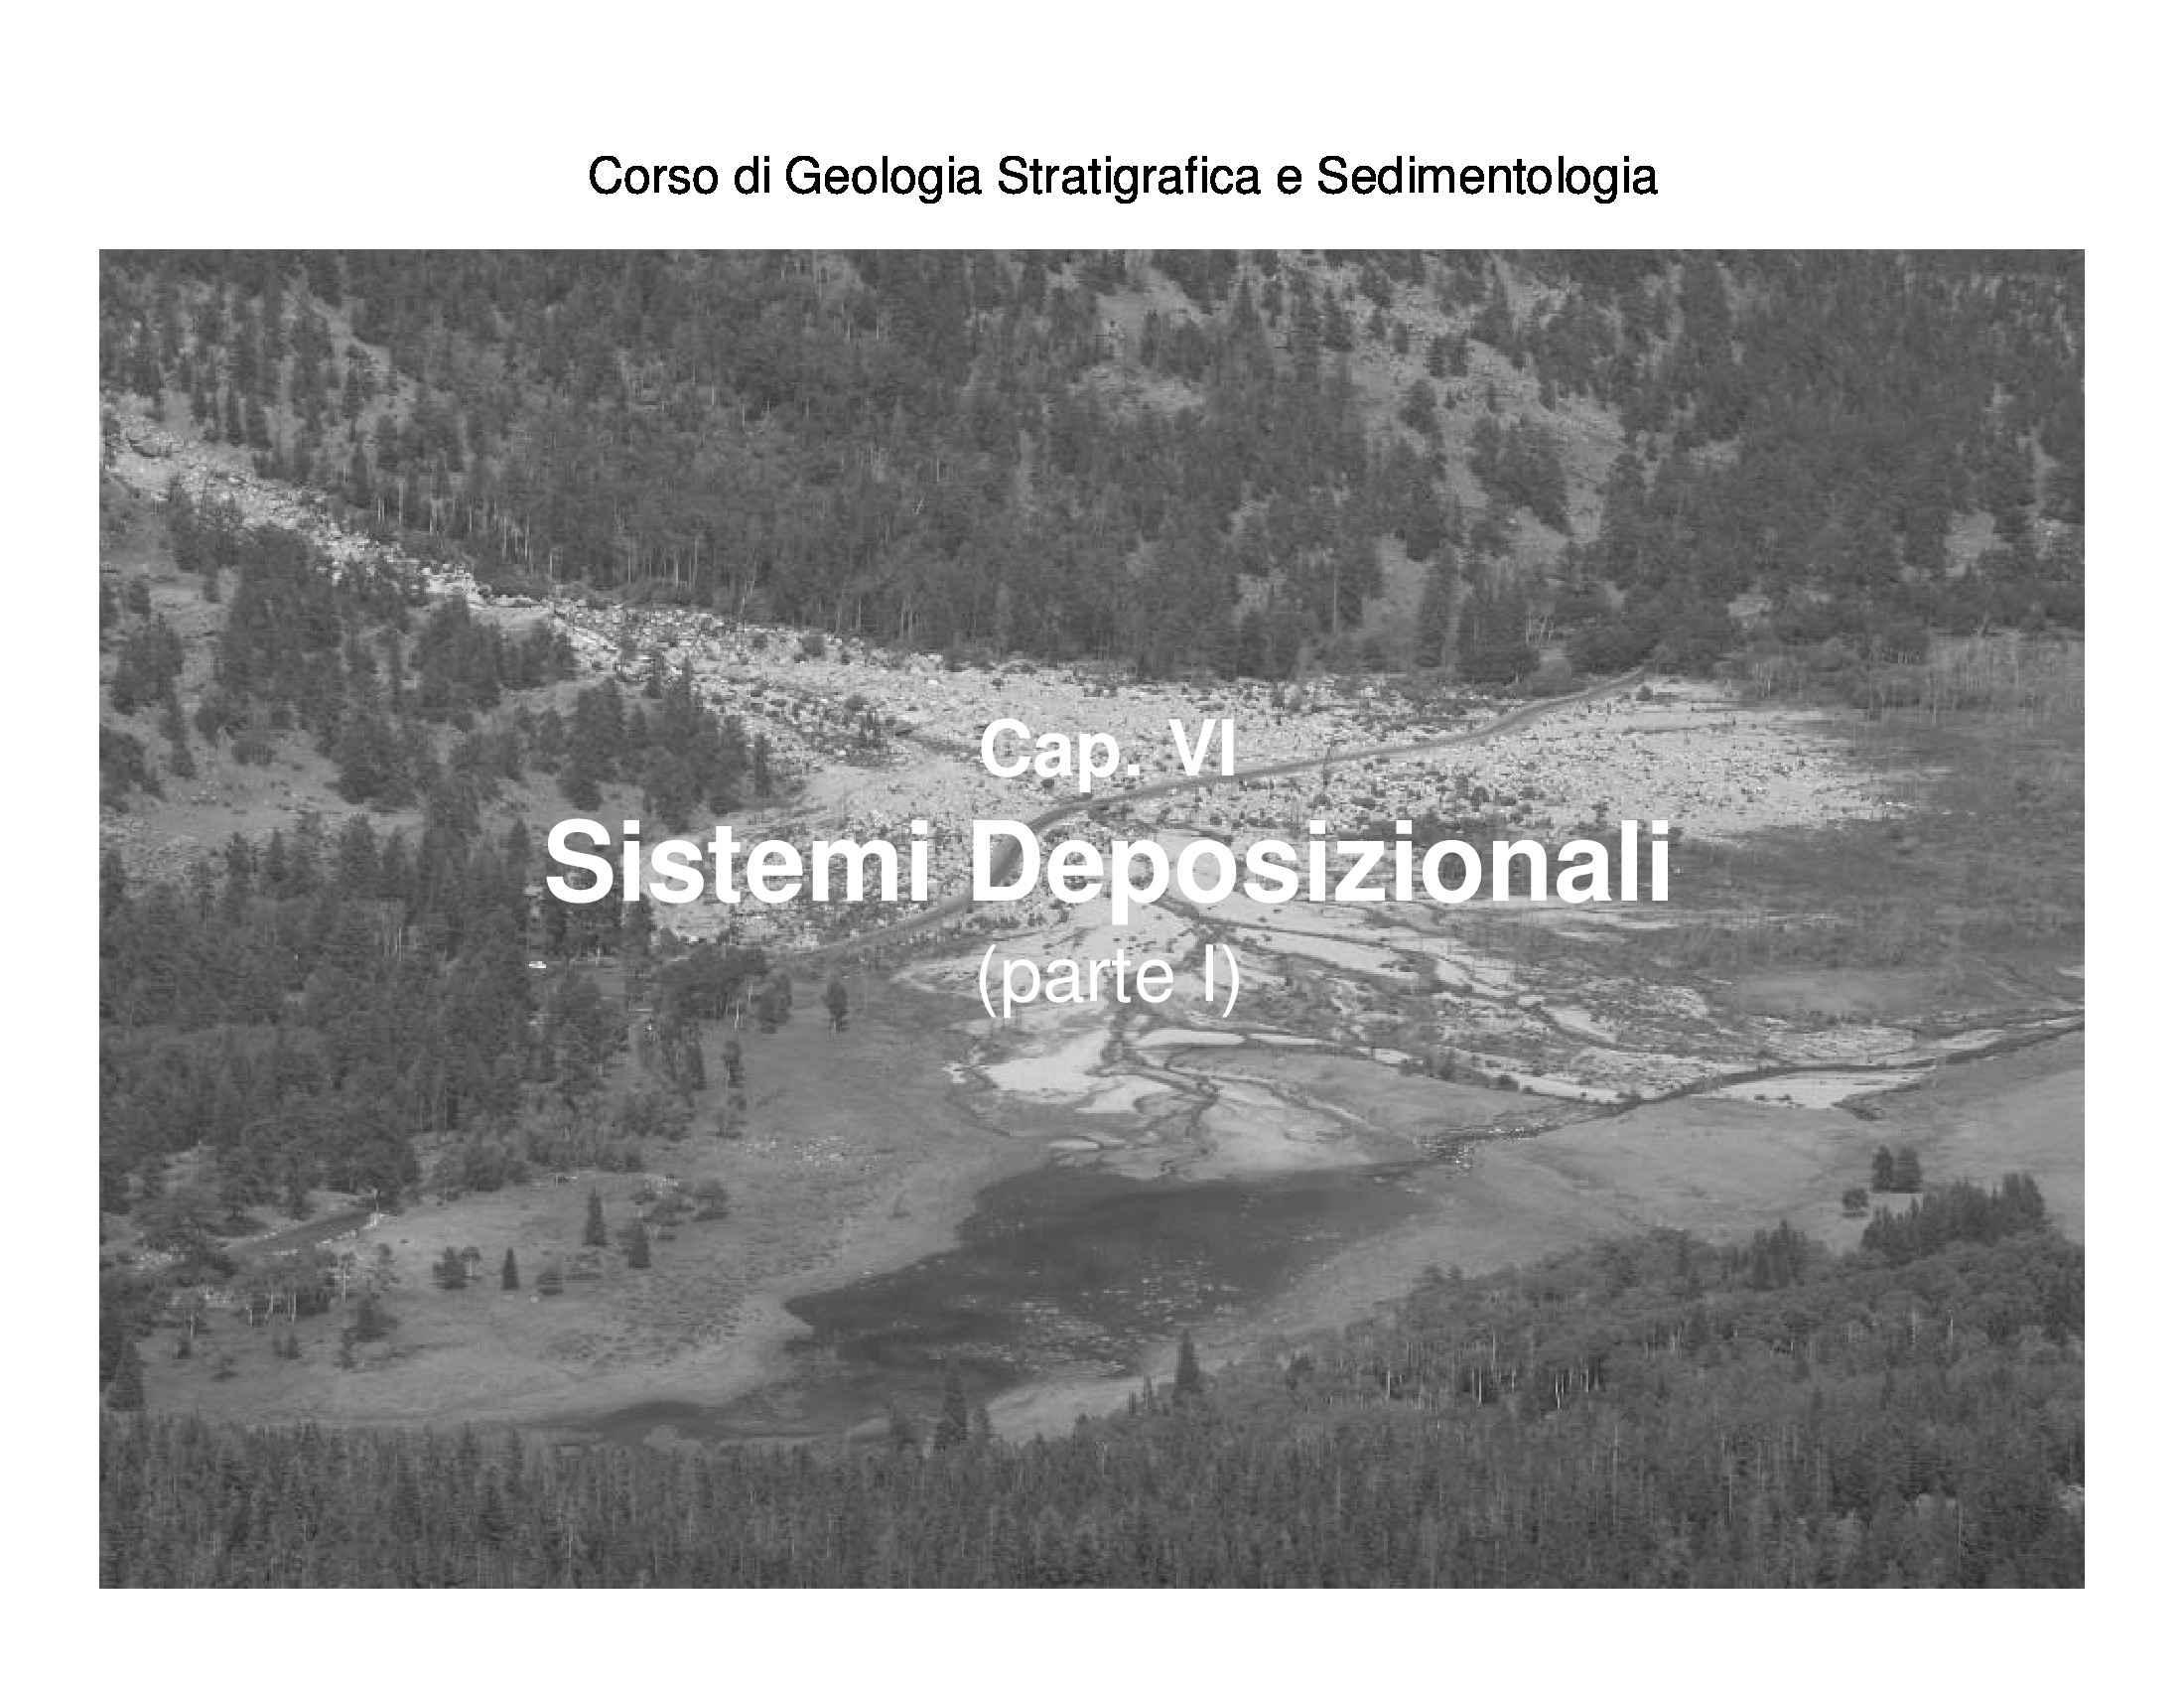 Sistemi deposizionali fluviali